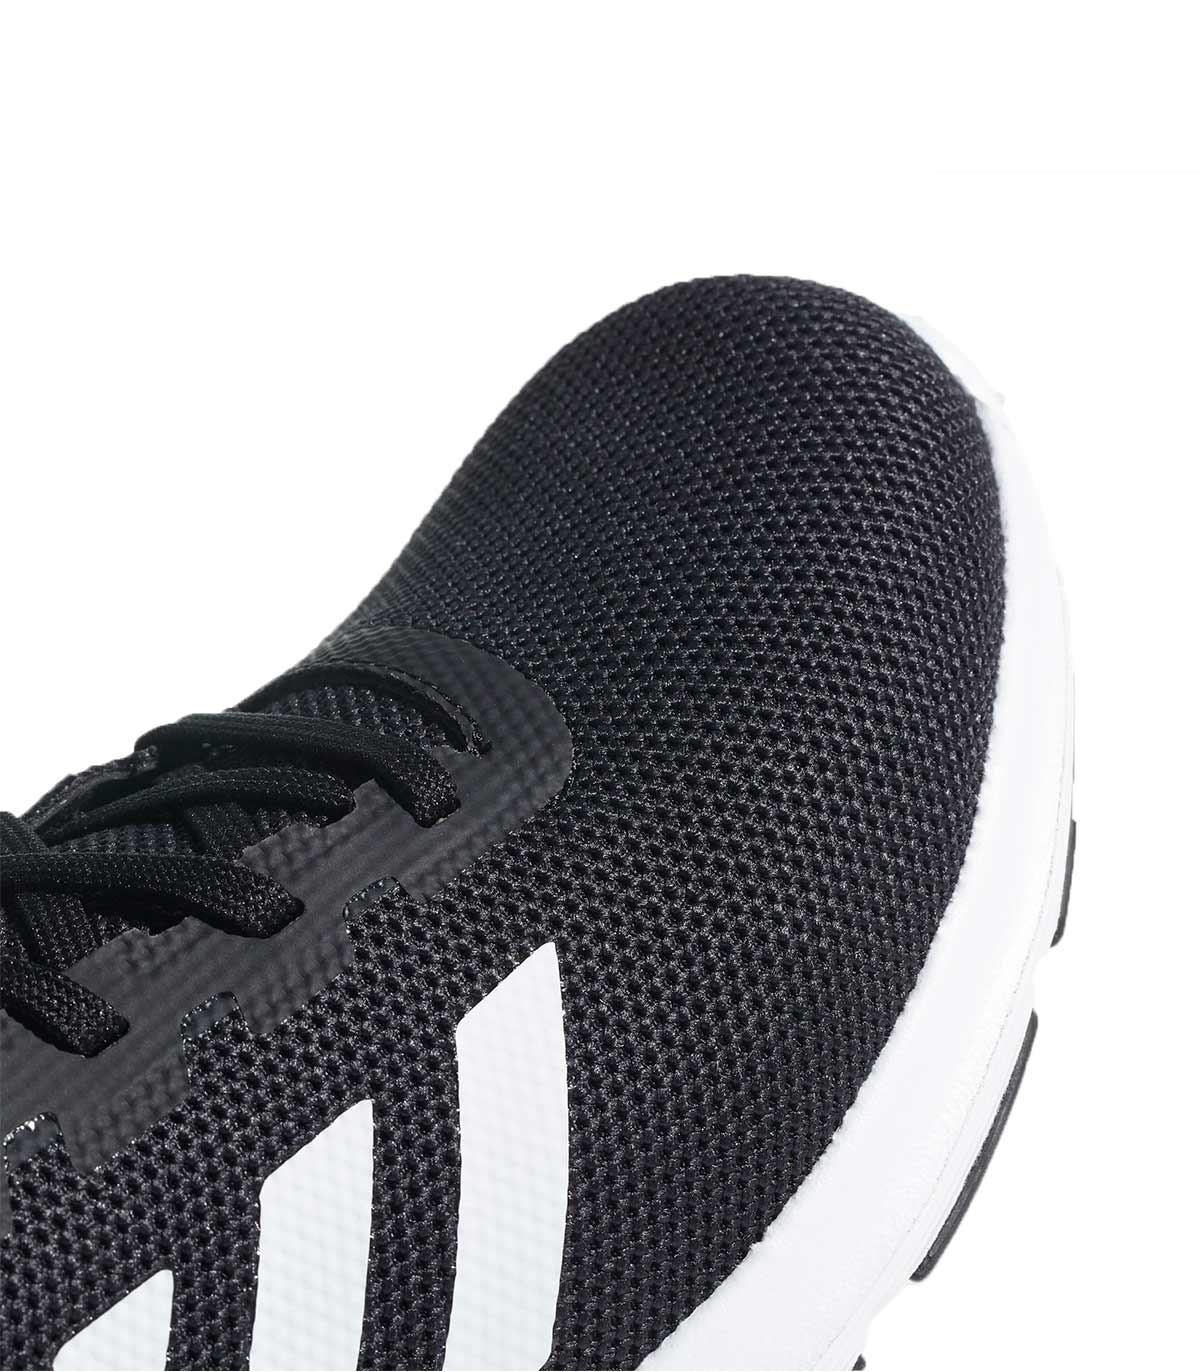 the best attitude f1585 a3cf5 Comprar Zapatillas Adidas Cosmic 2